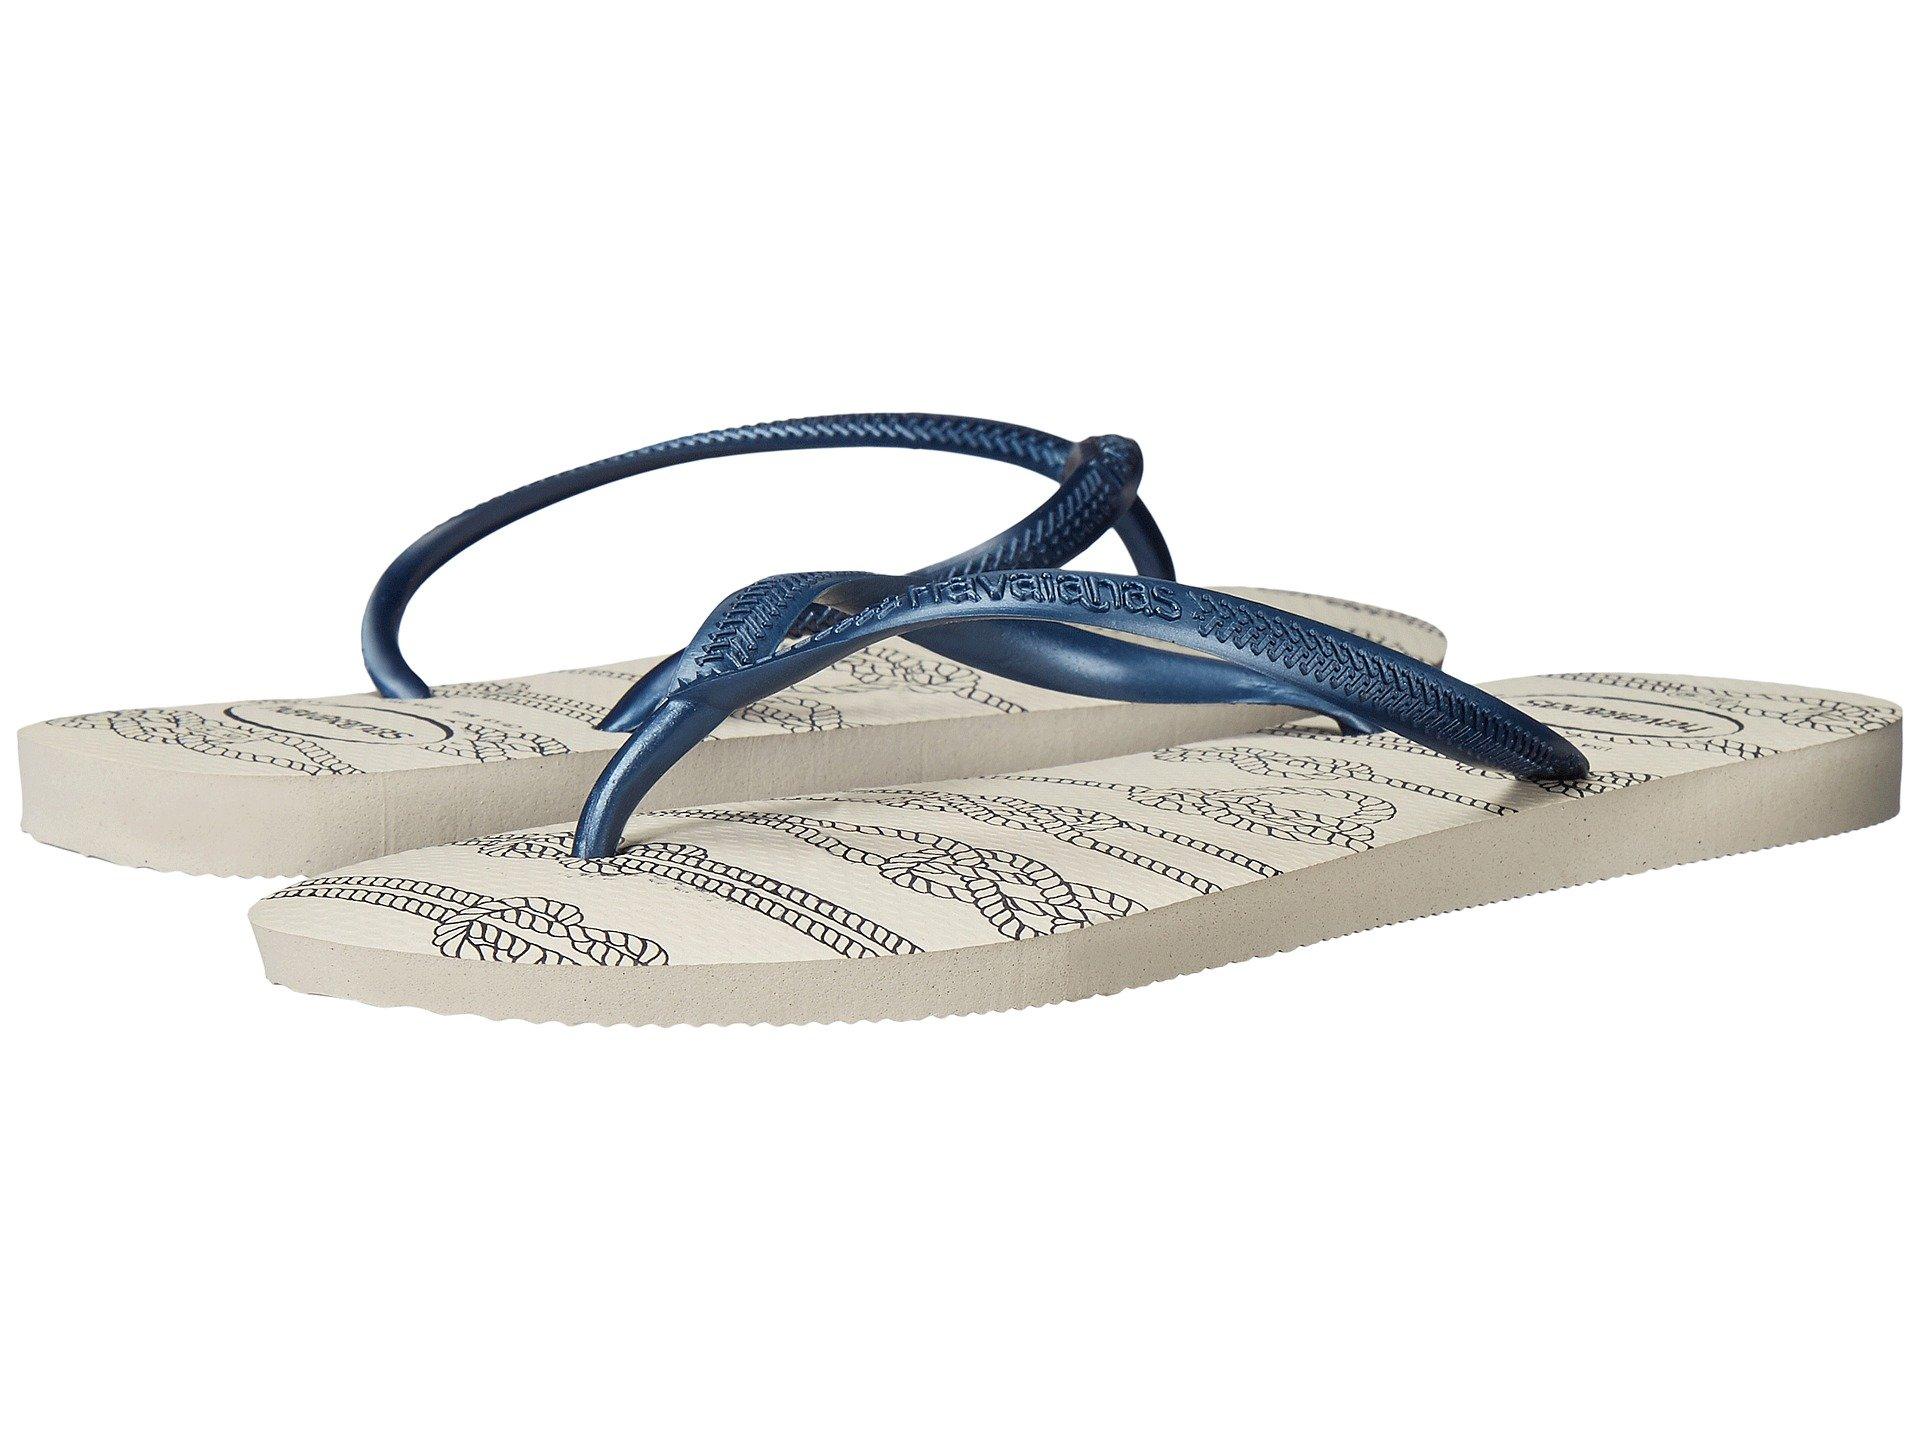 789c1be34f41 Havaianas Slim Nautical Flip-Flops